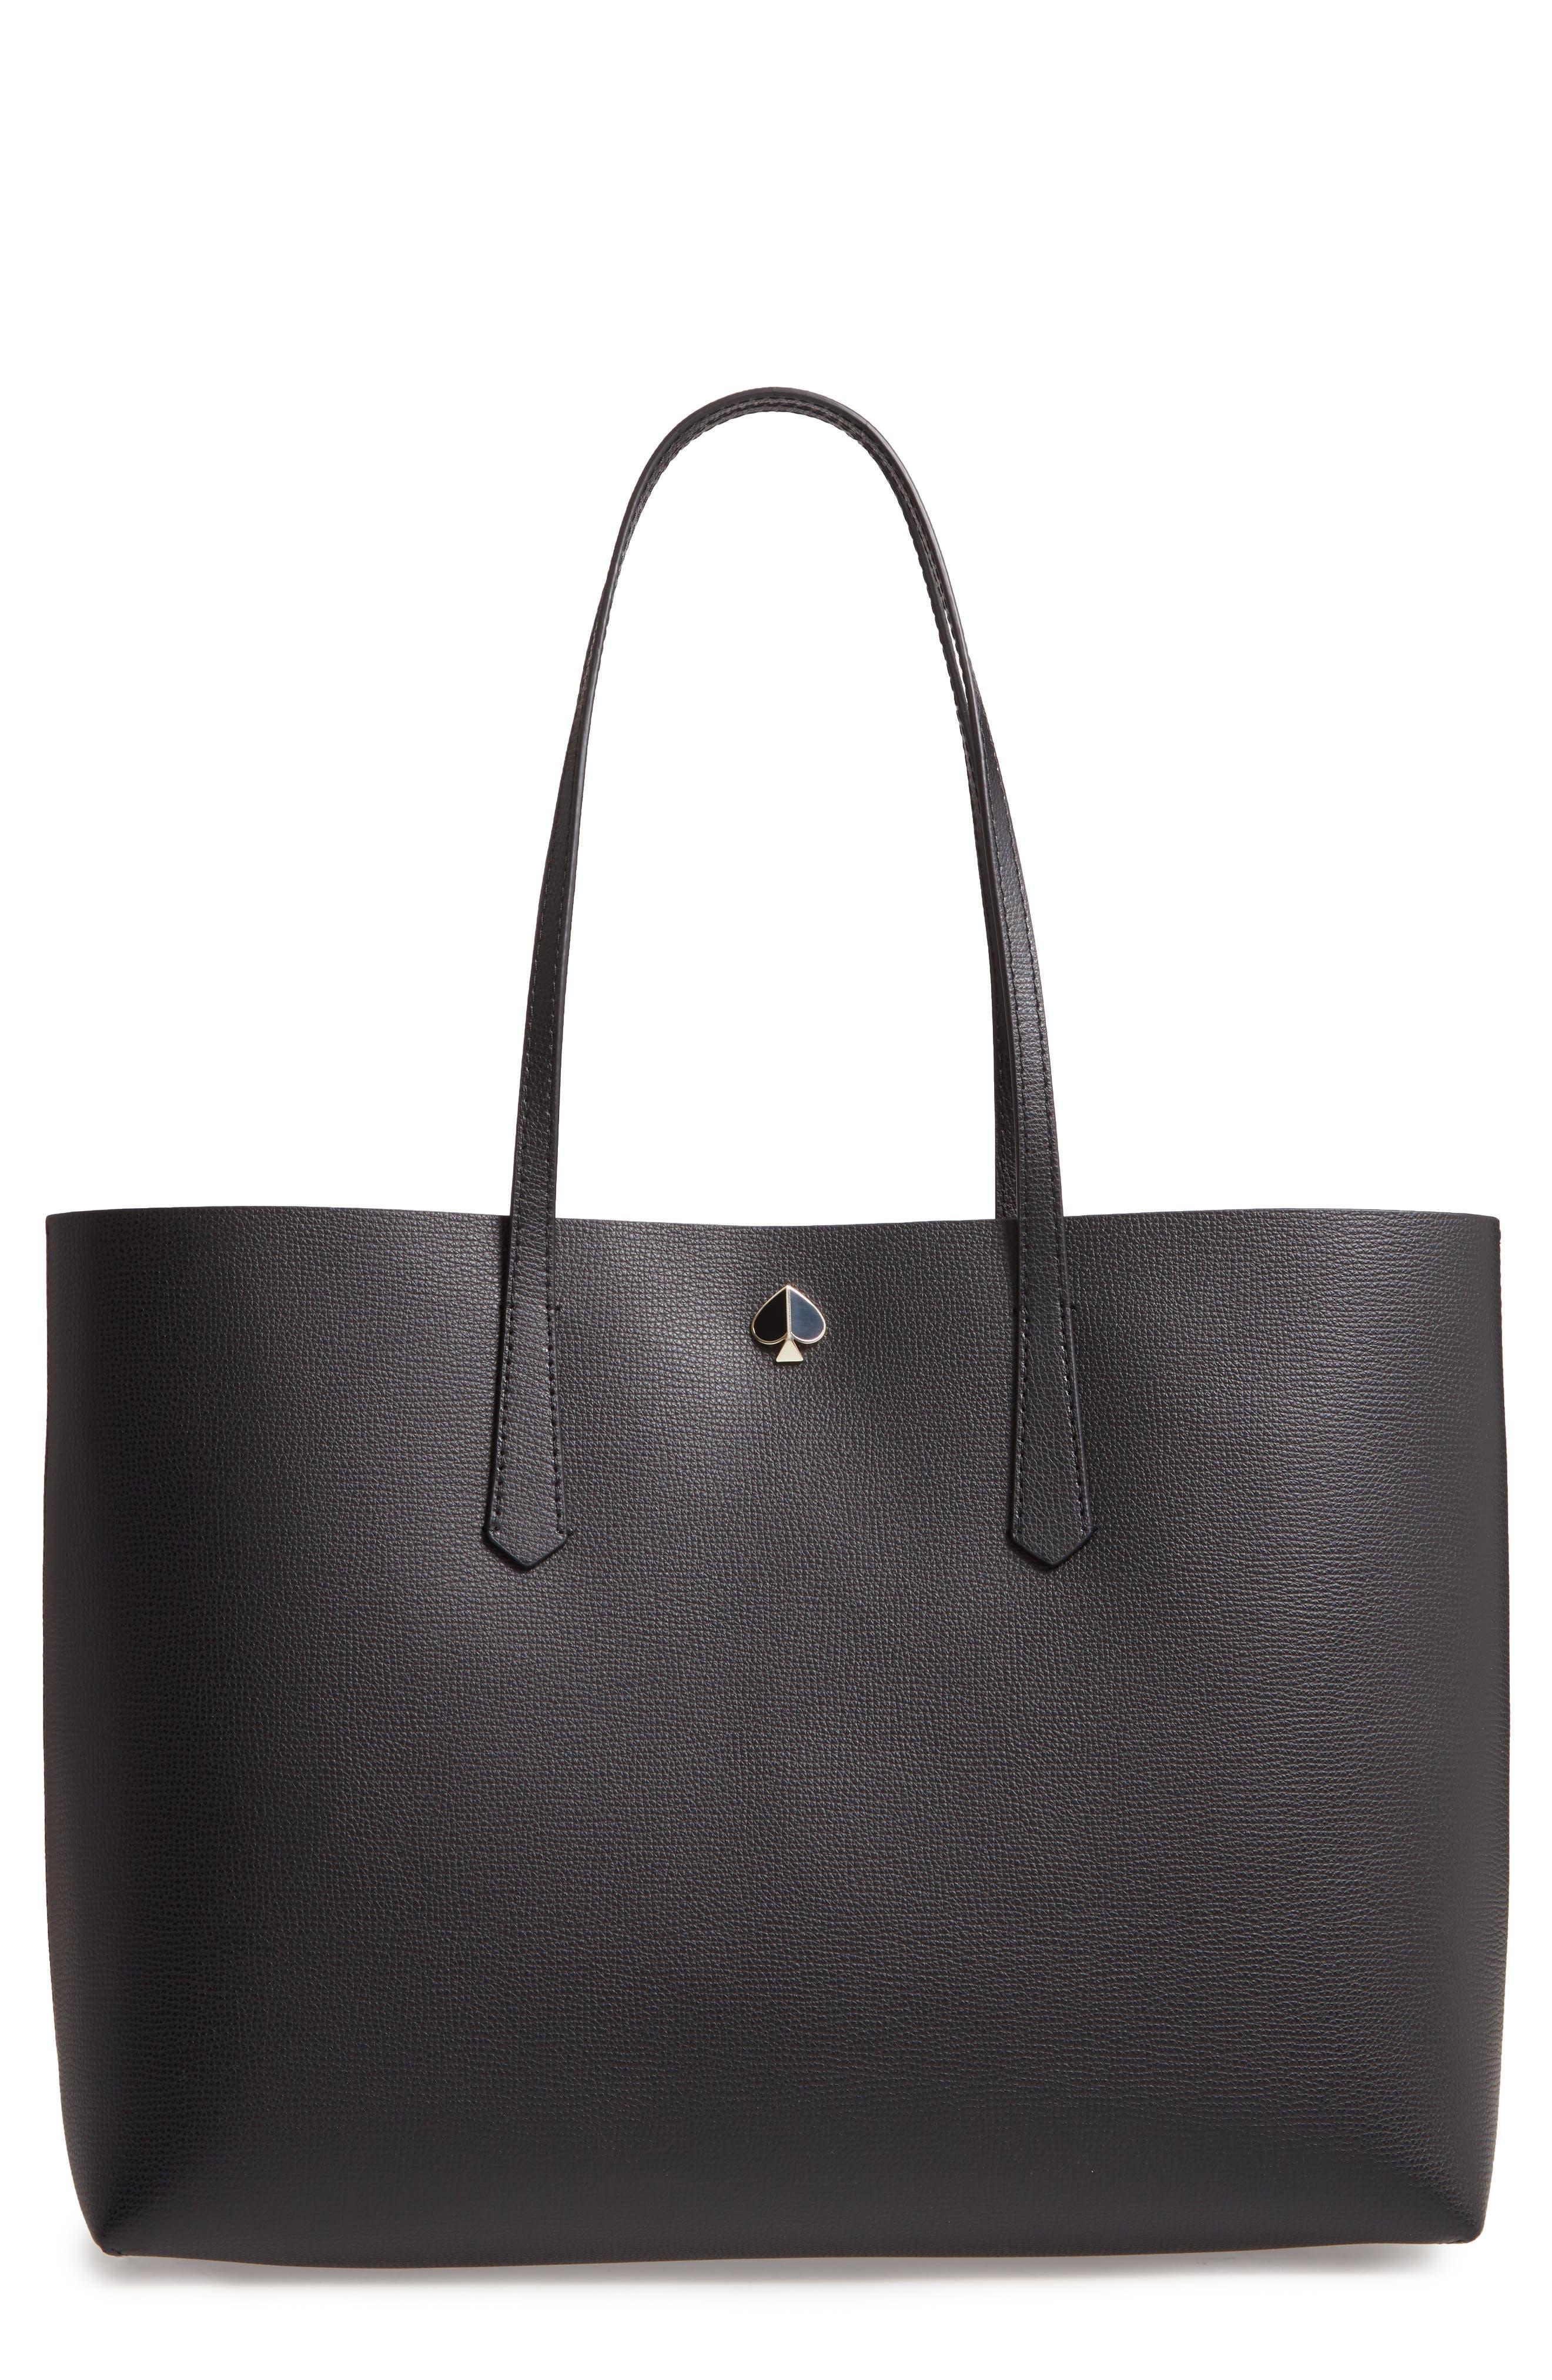 028d450553 Women's kate spade new york Handbags | Nordstrom